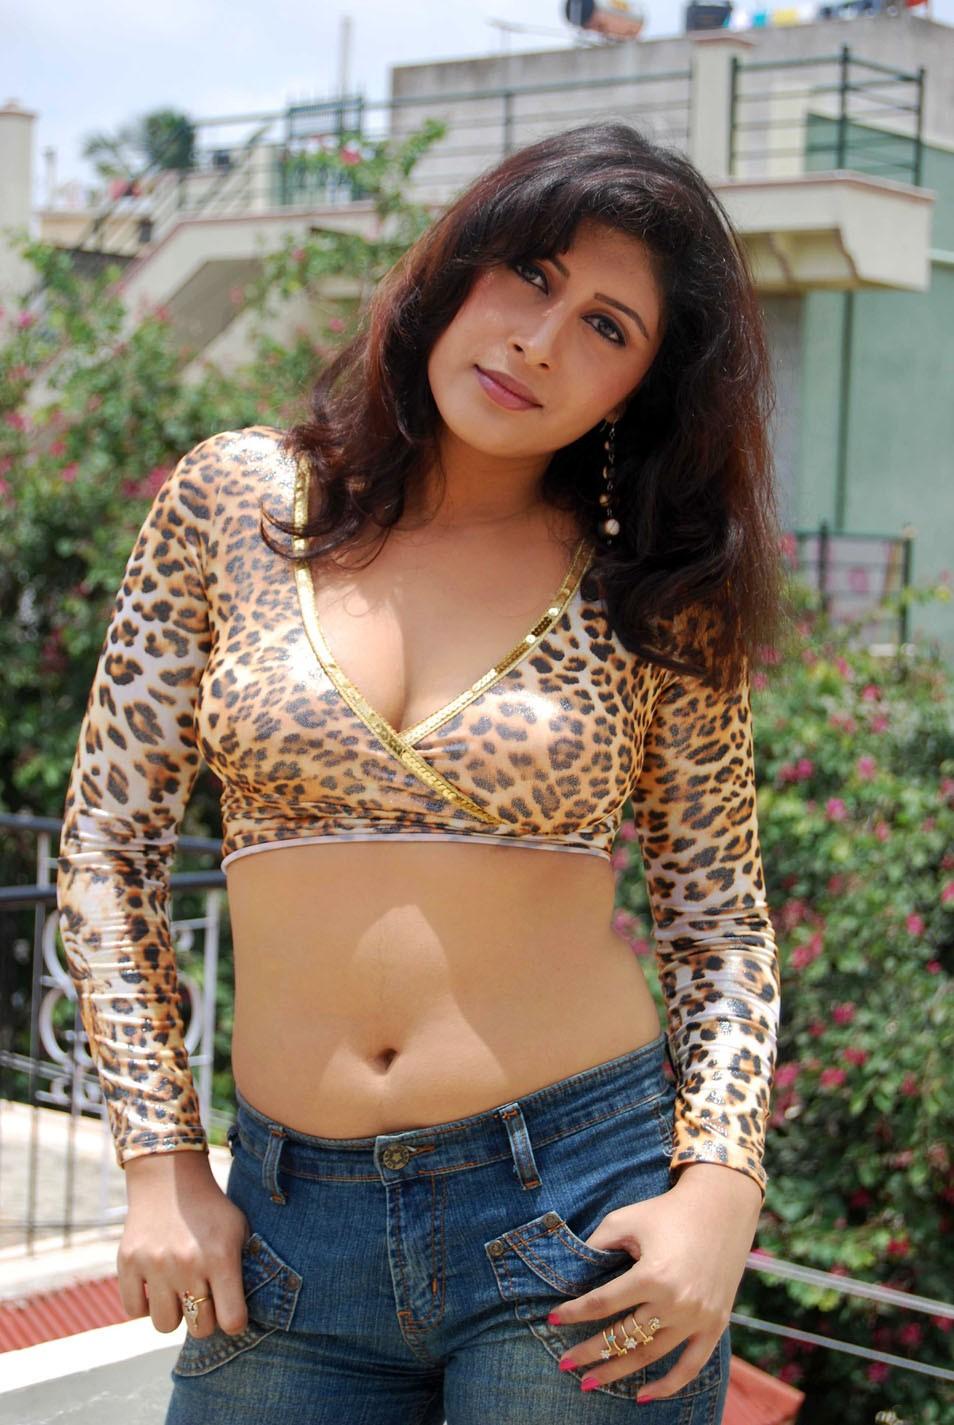 xxx ranjeeta tits Big actres